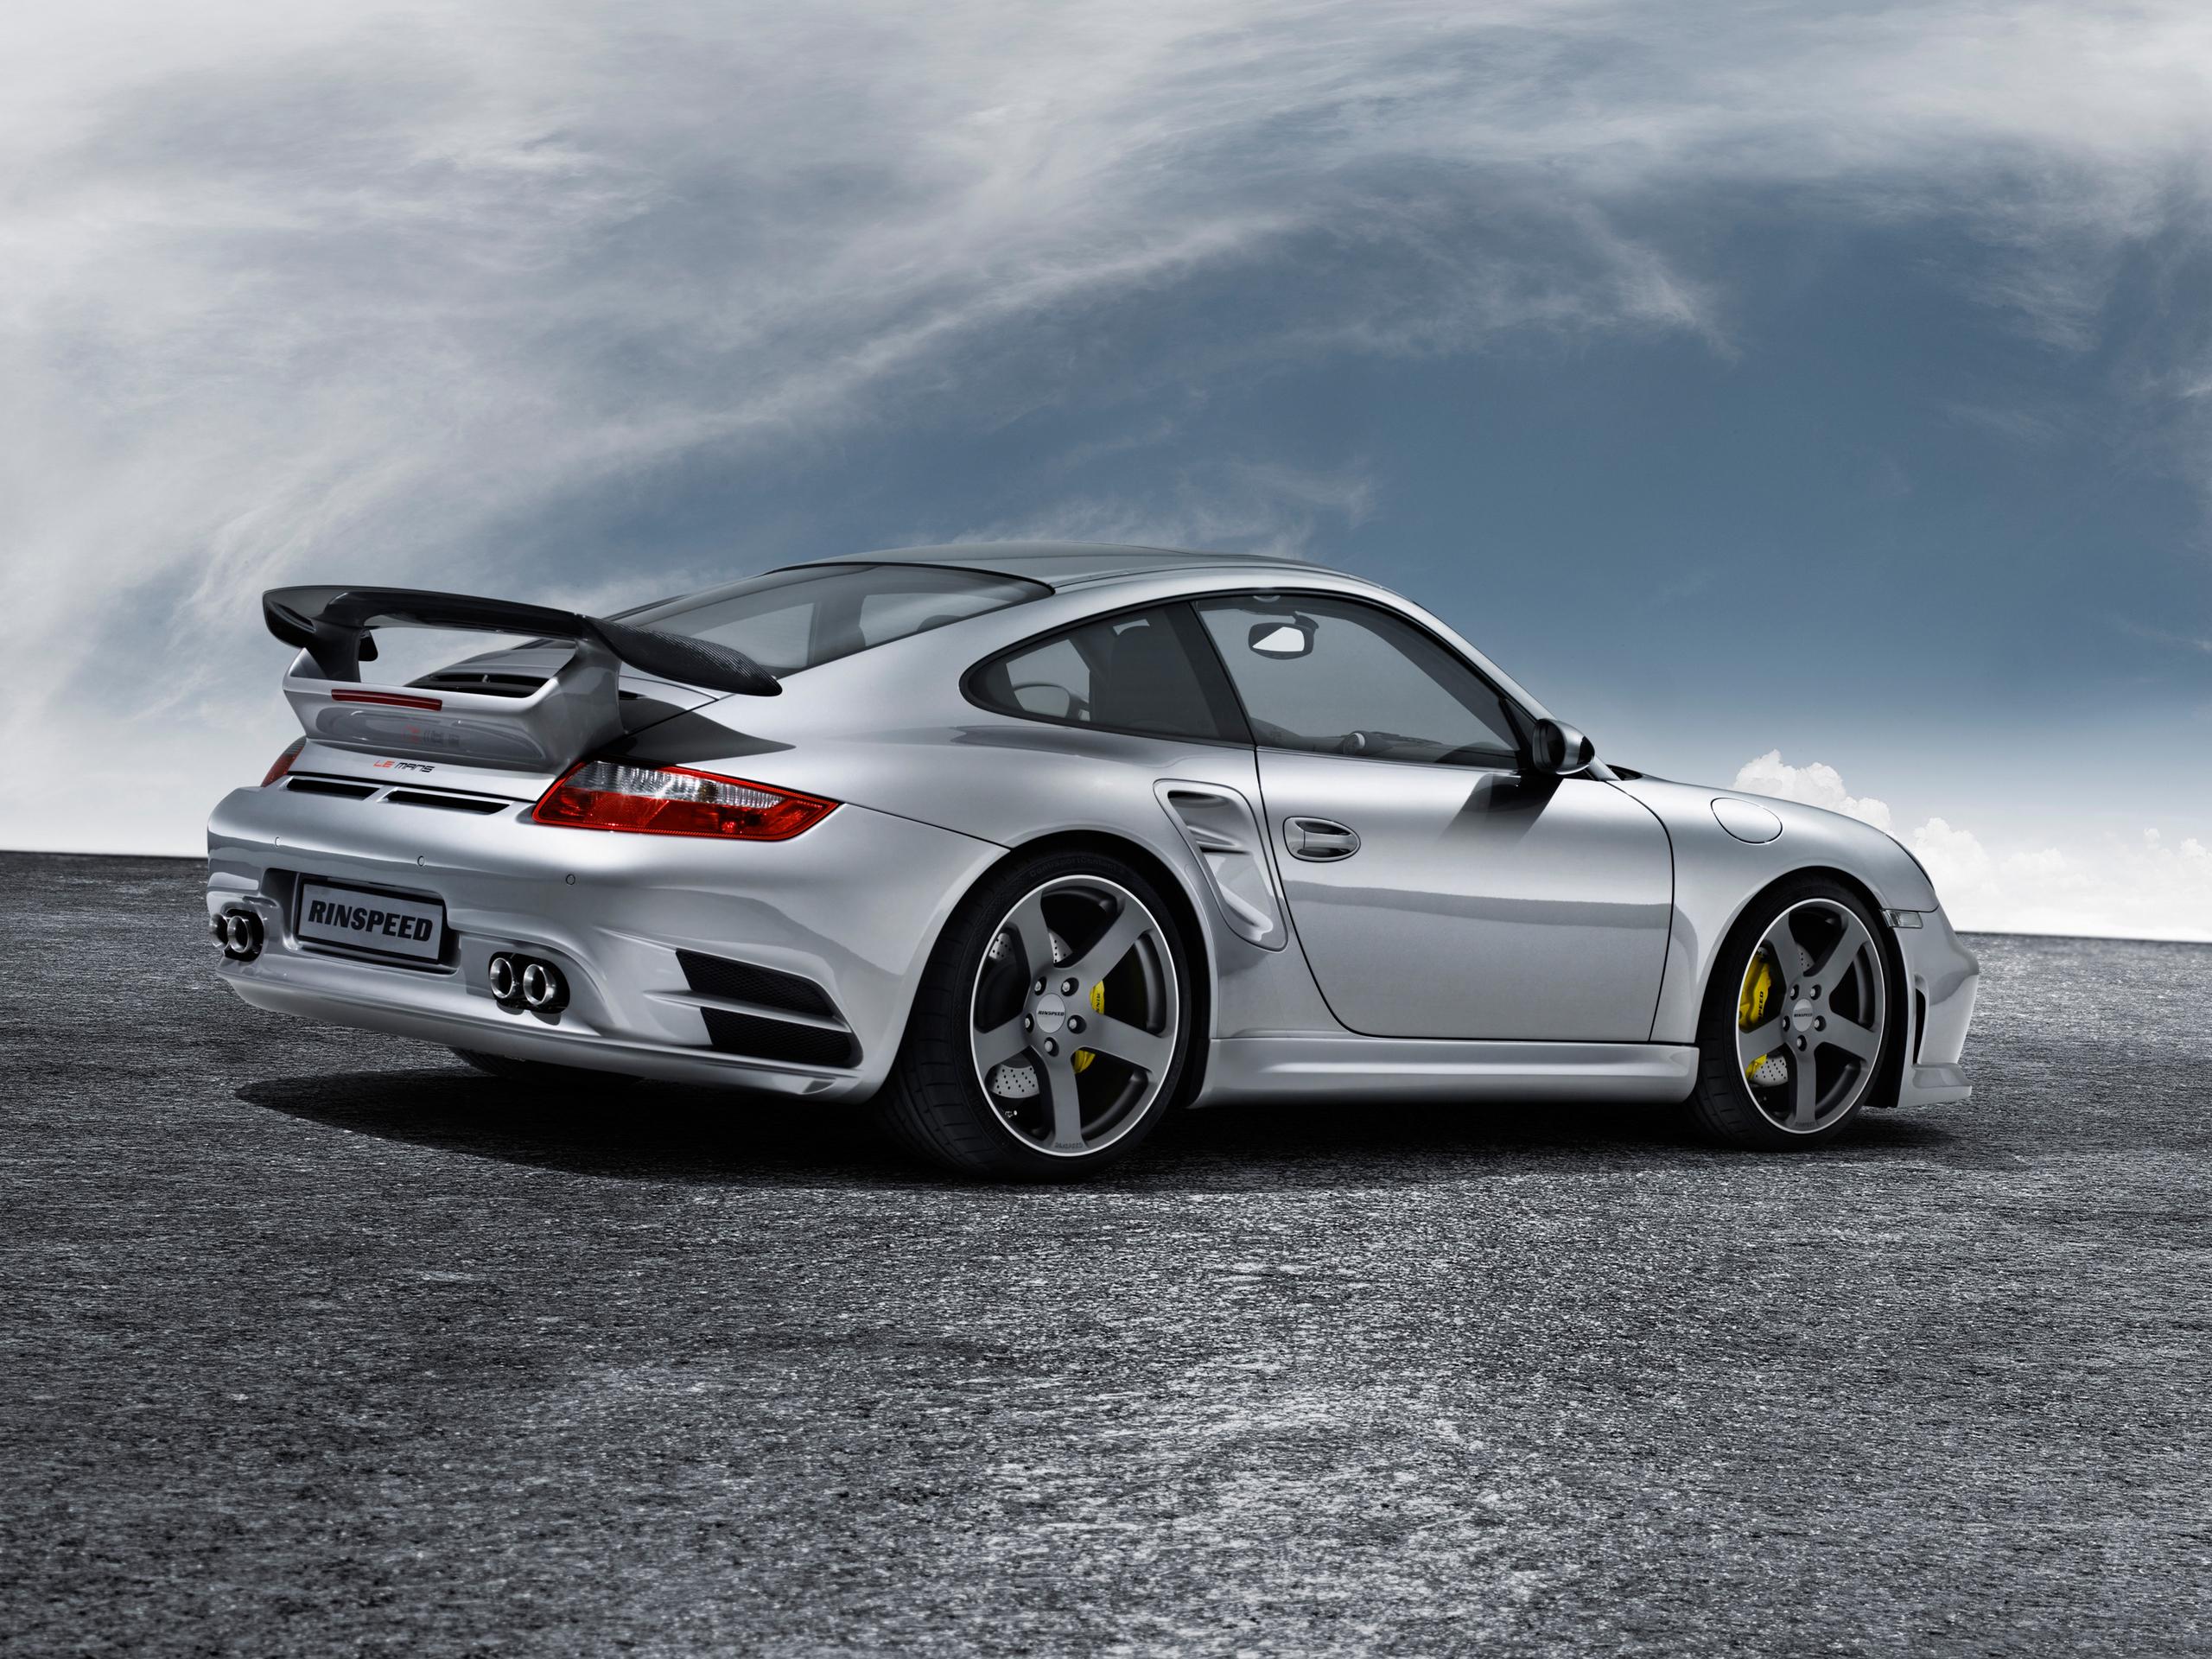 PORSCHE 997 TURBO BY RINSPEED   Porsche Wallpaper 15774334 2560x1920